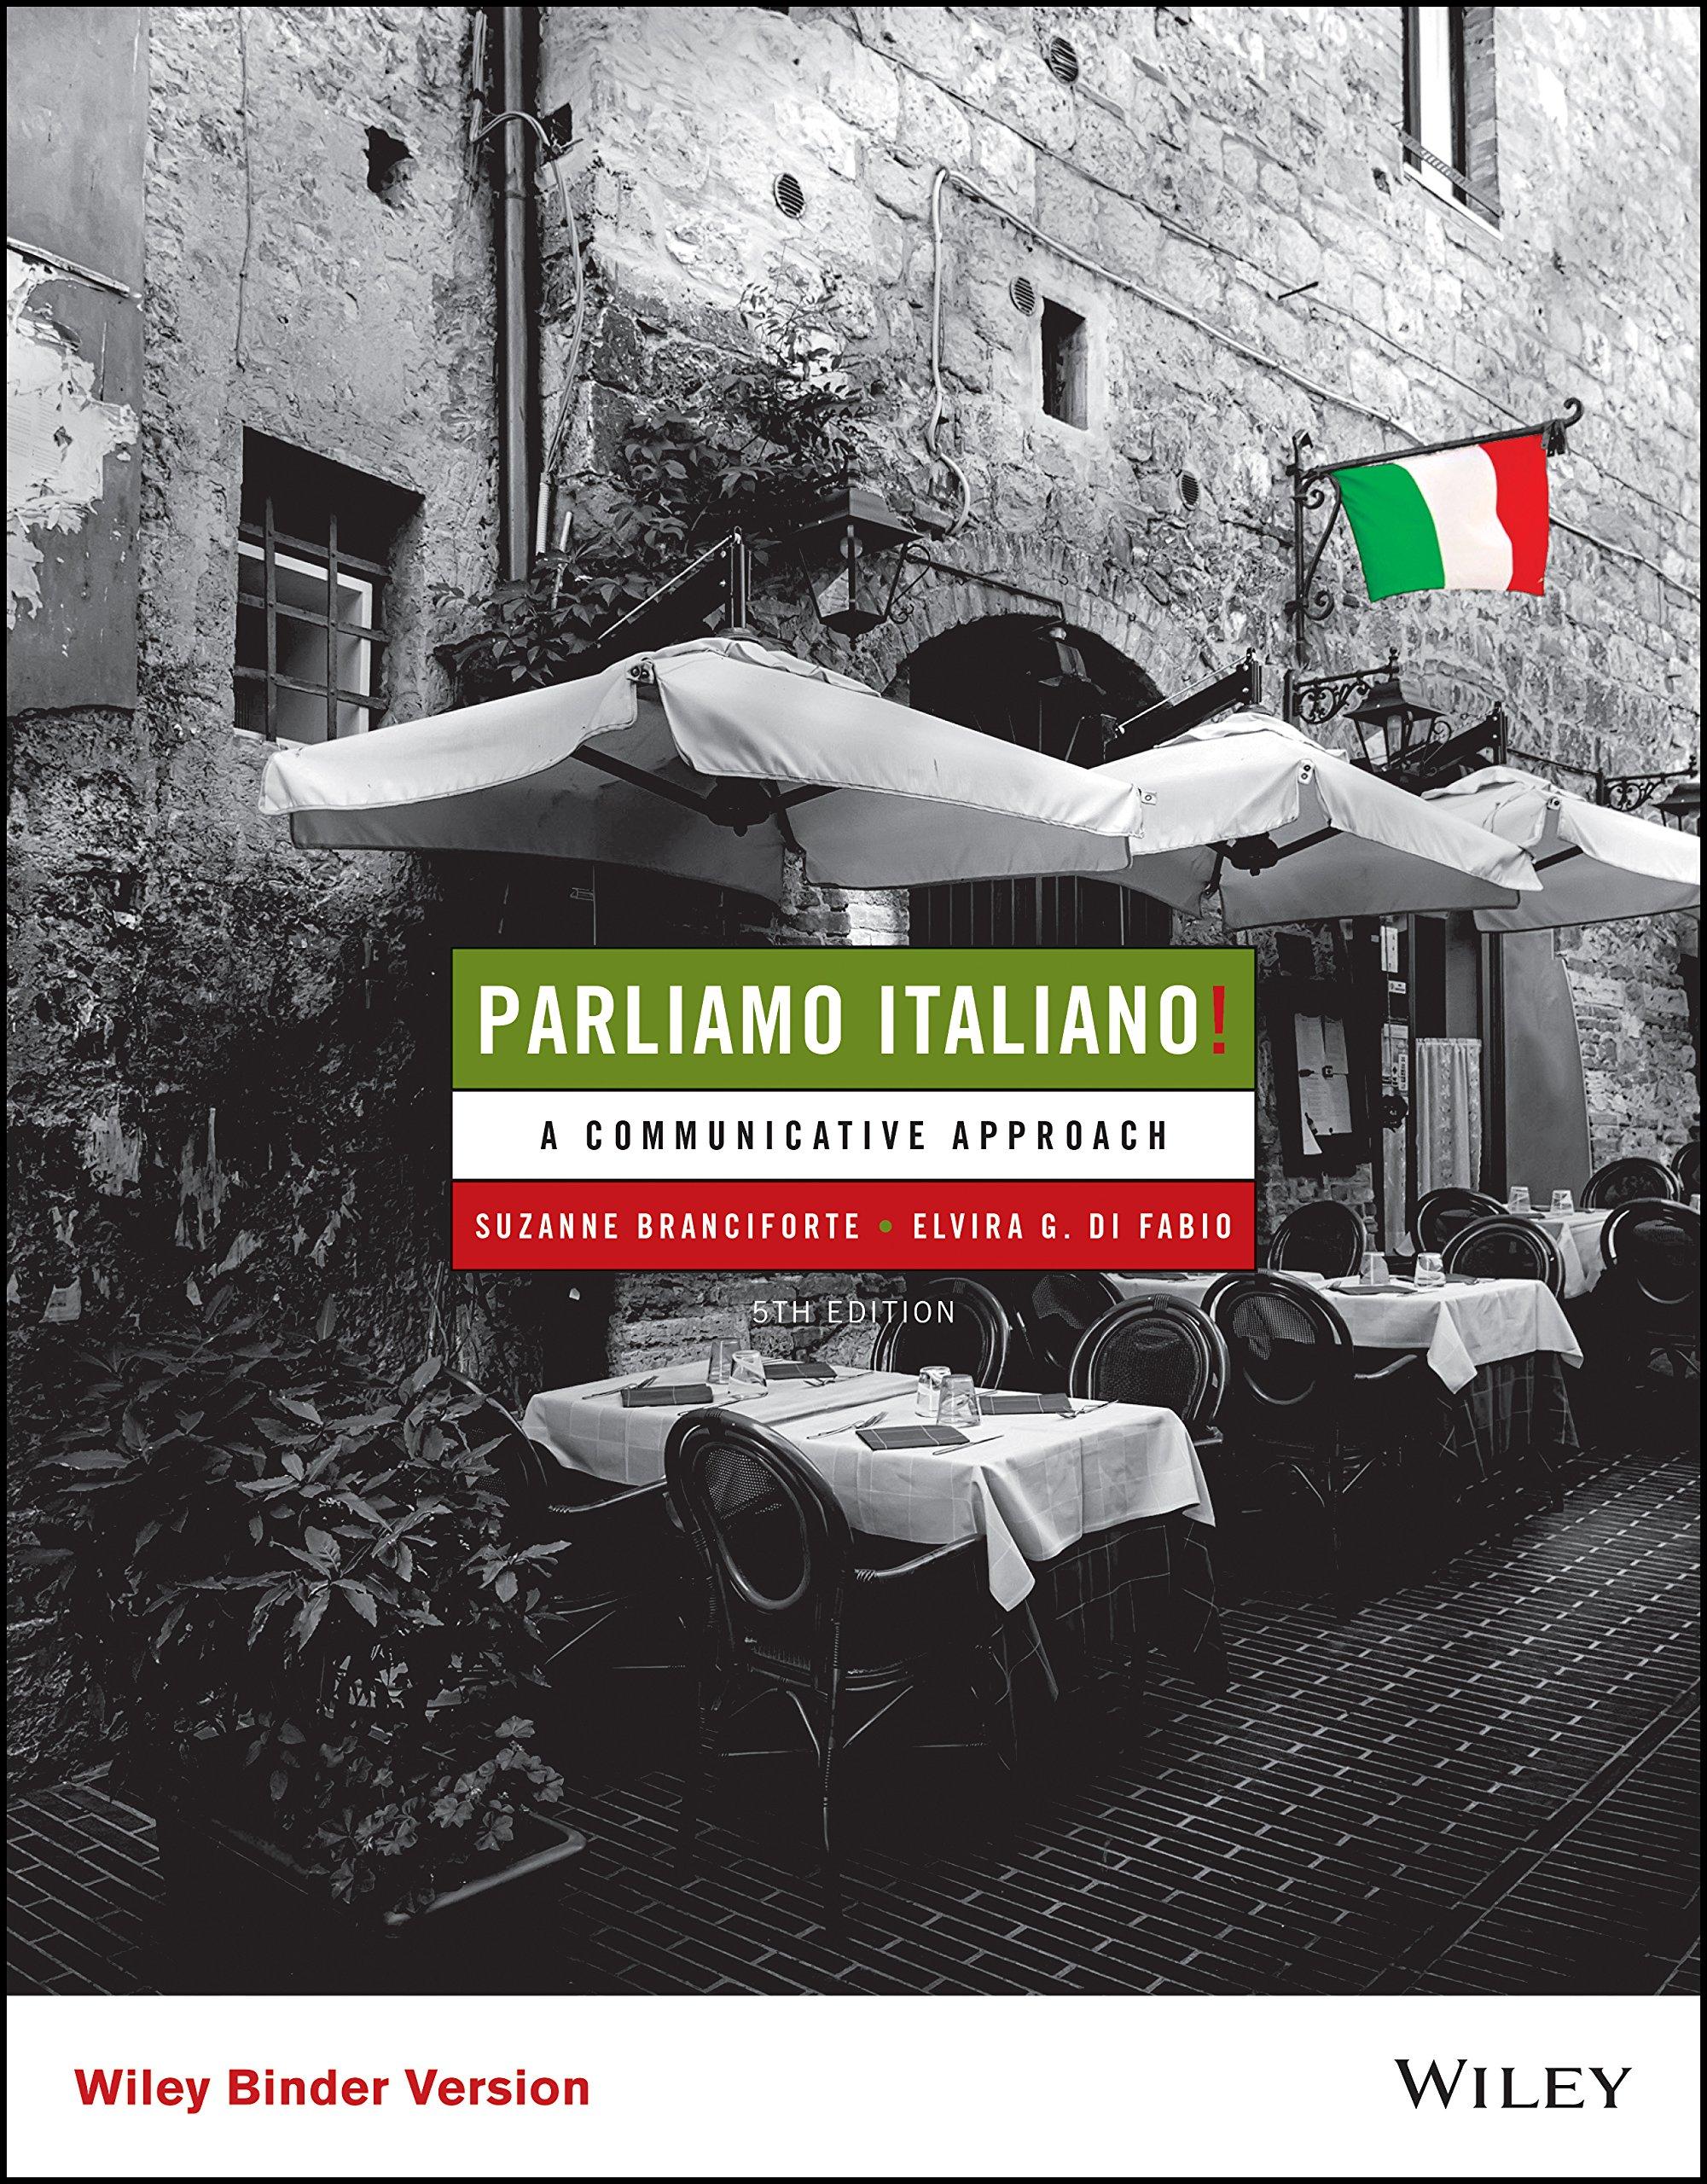 Parliamo Italiano Edition 5 A Communicative Approach Kindle Edition By Branciforte Suzanne Di Fabio Elvira Miele Gina M Reference Kindle Ebooks Amazon Com